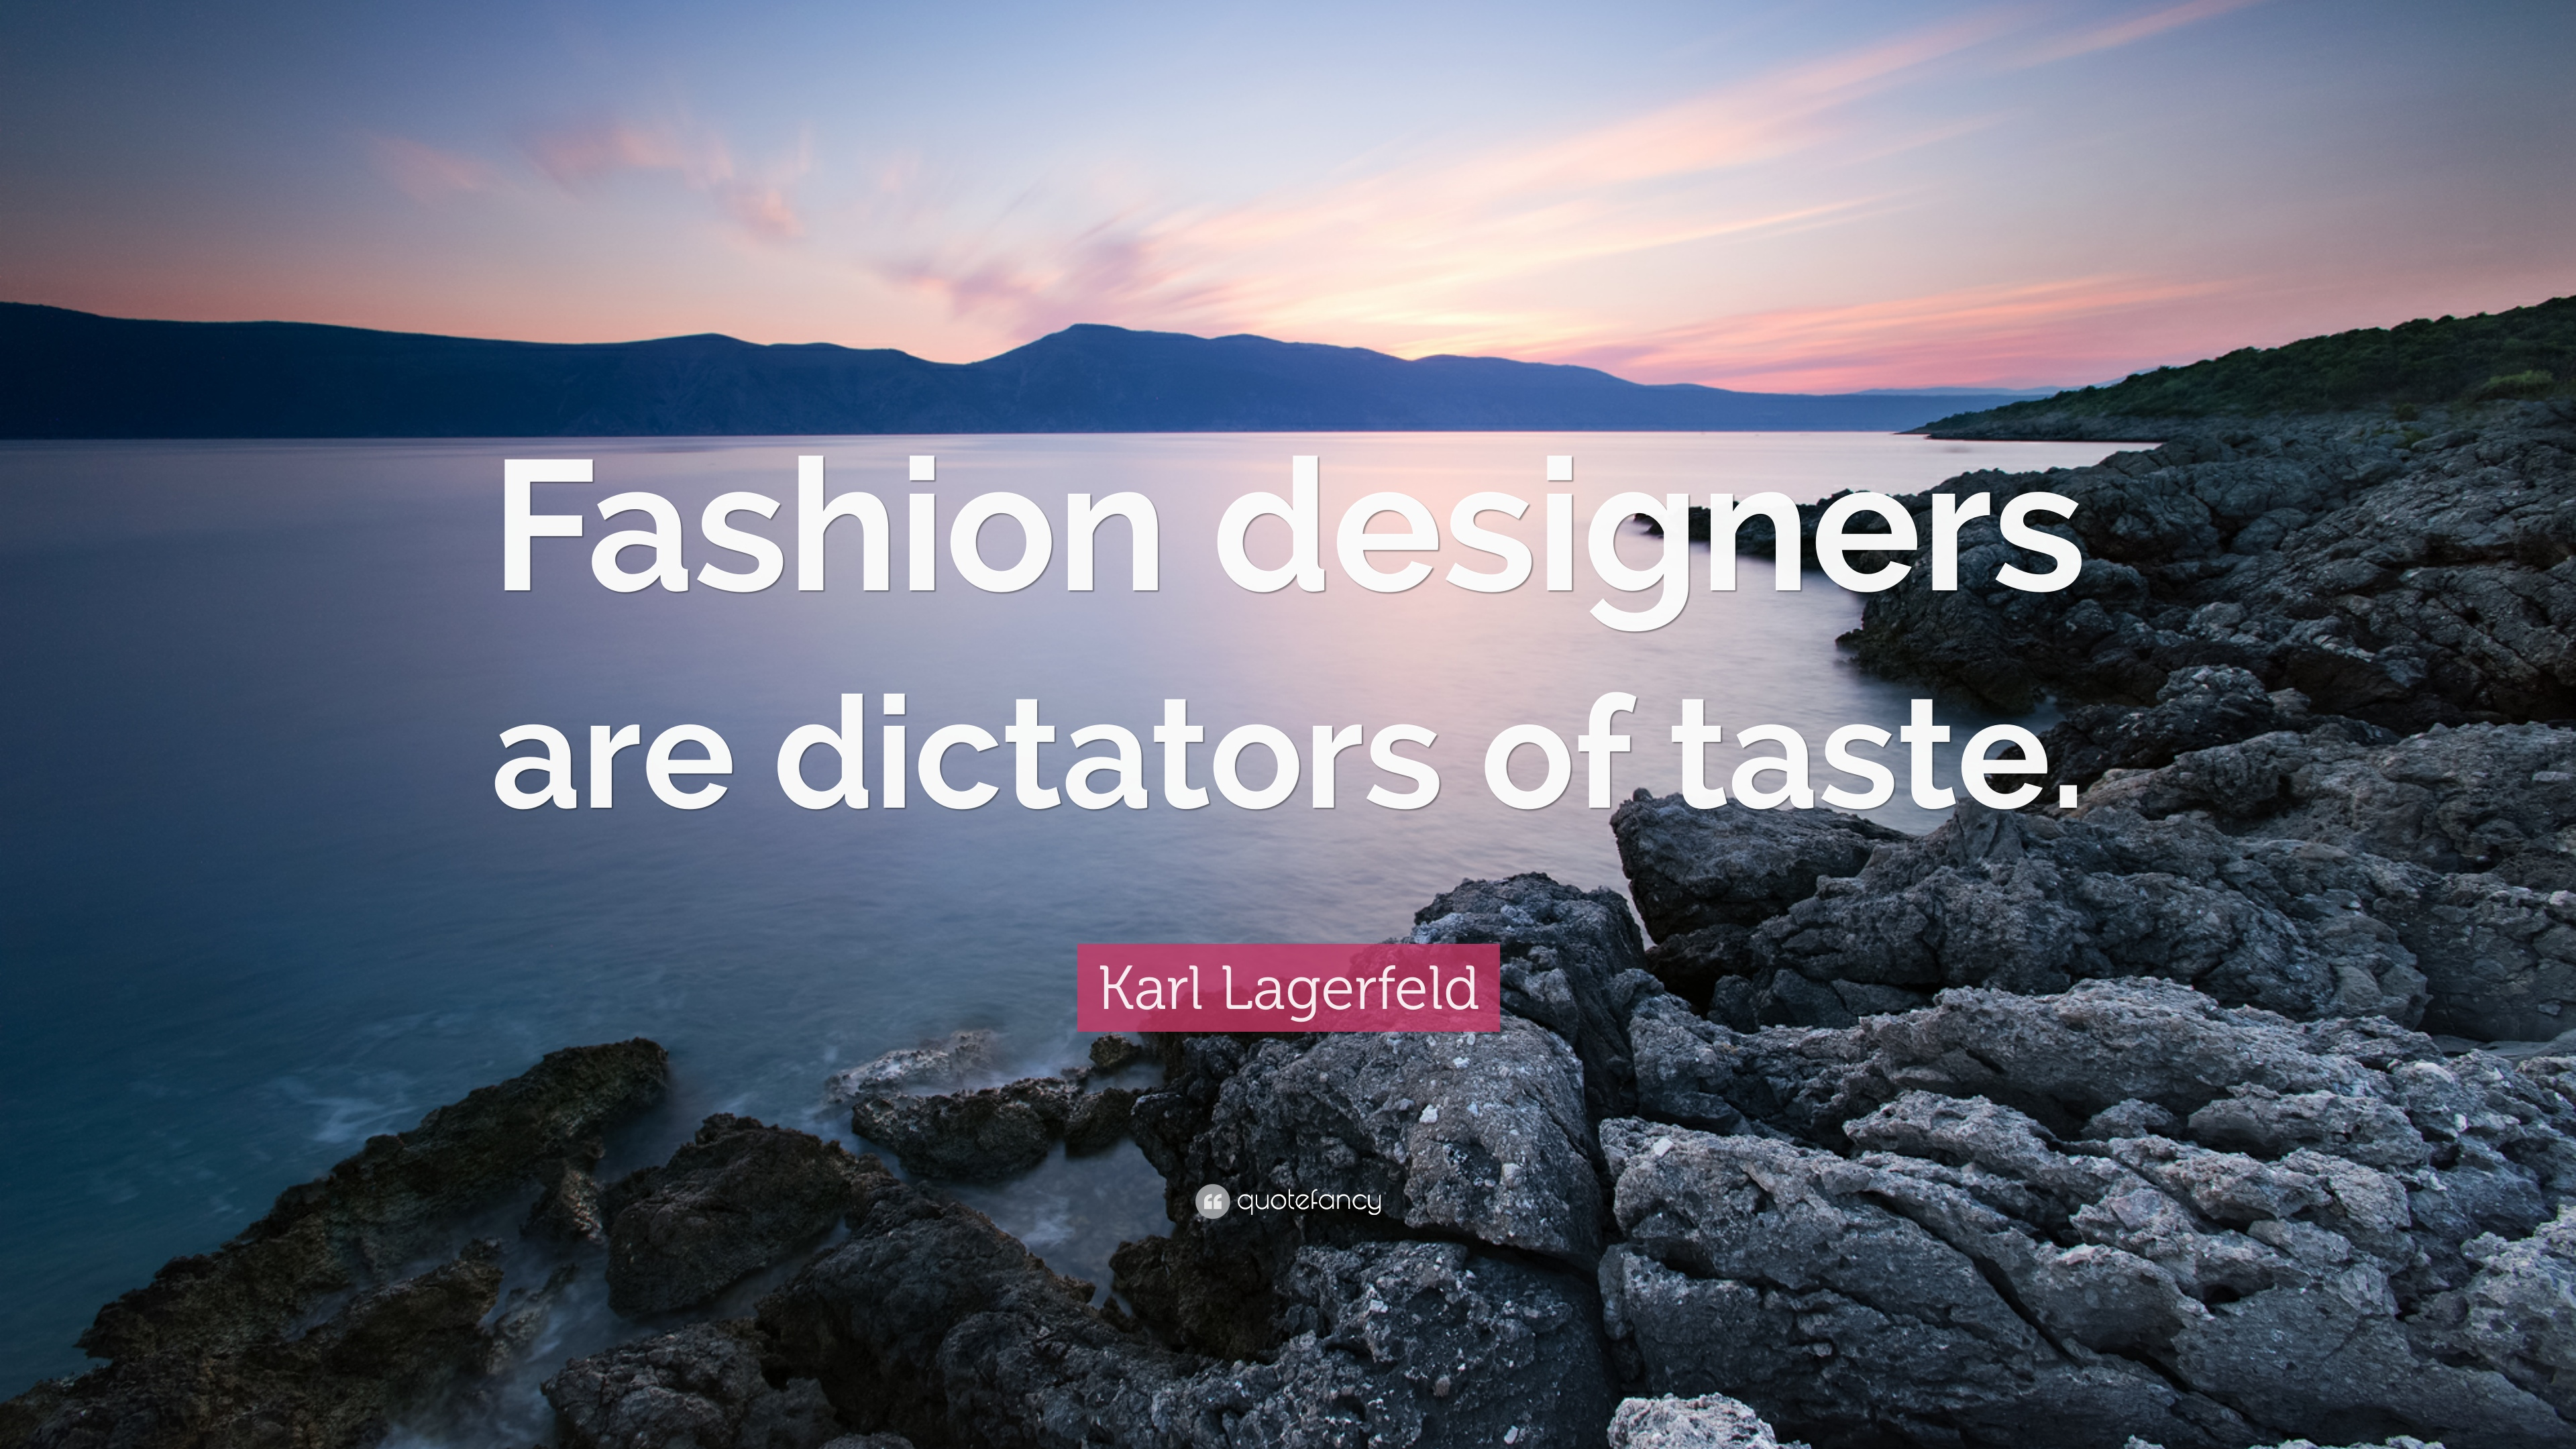 Karl Lagerfeld Quote \u201cFashion designers are dictators of